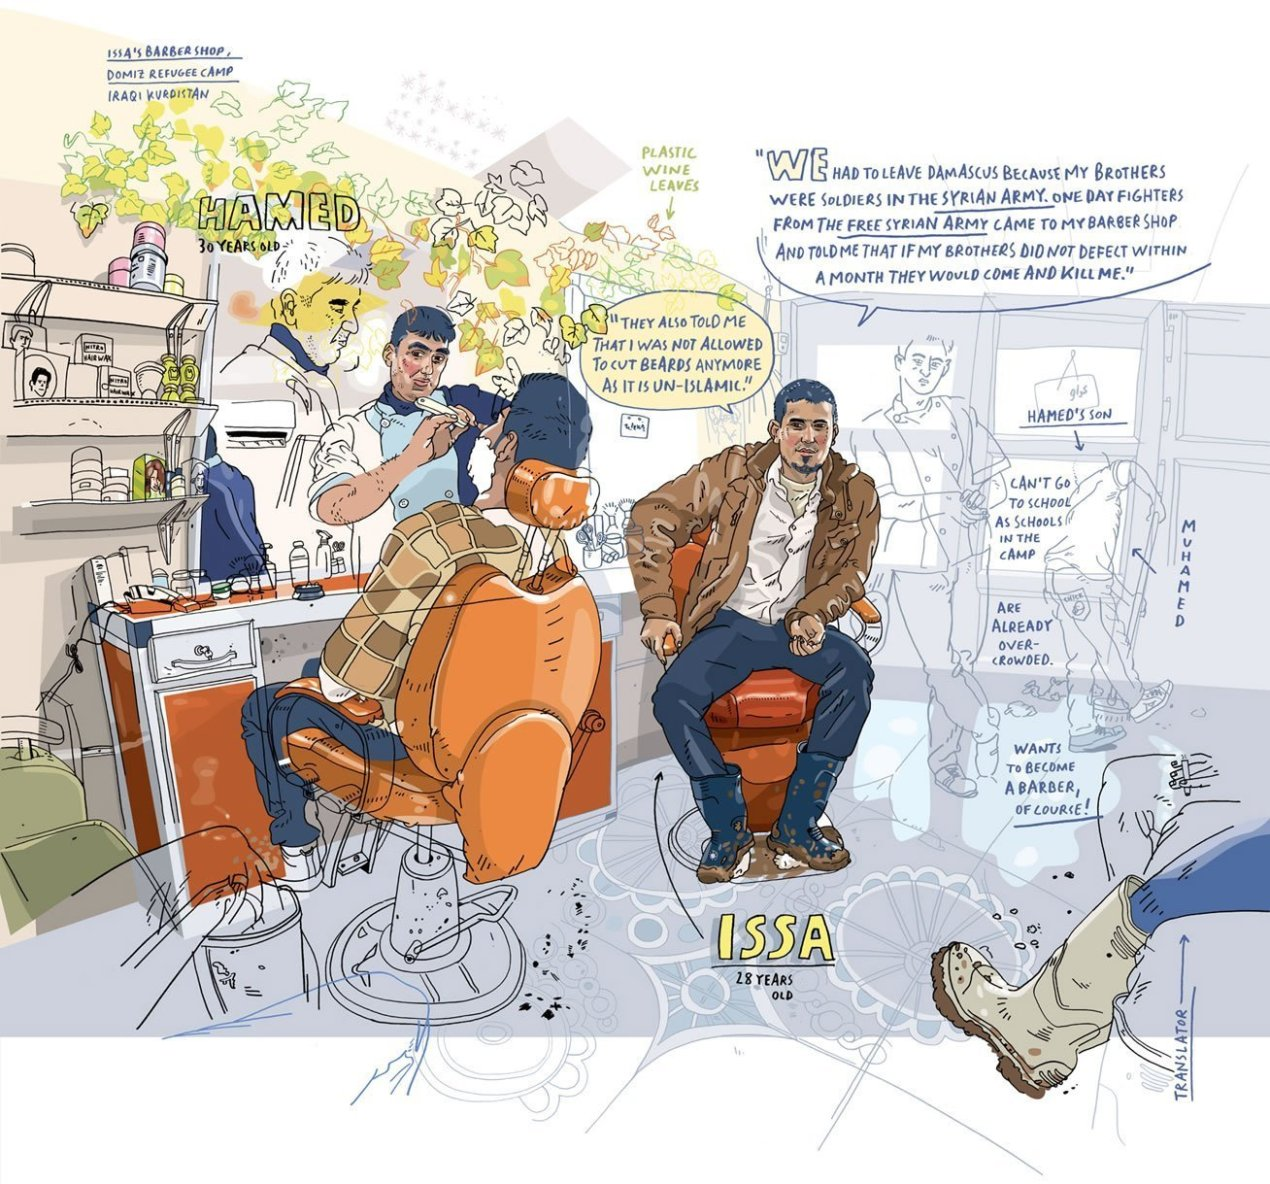 designplayground-Olivier_Kugler-3_issa_barbershop